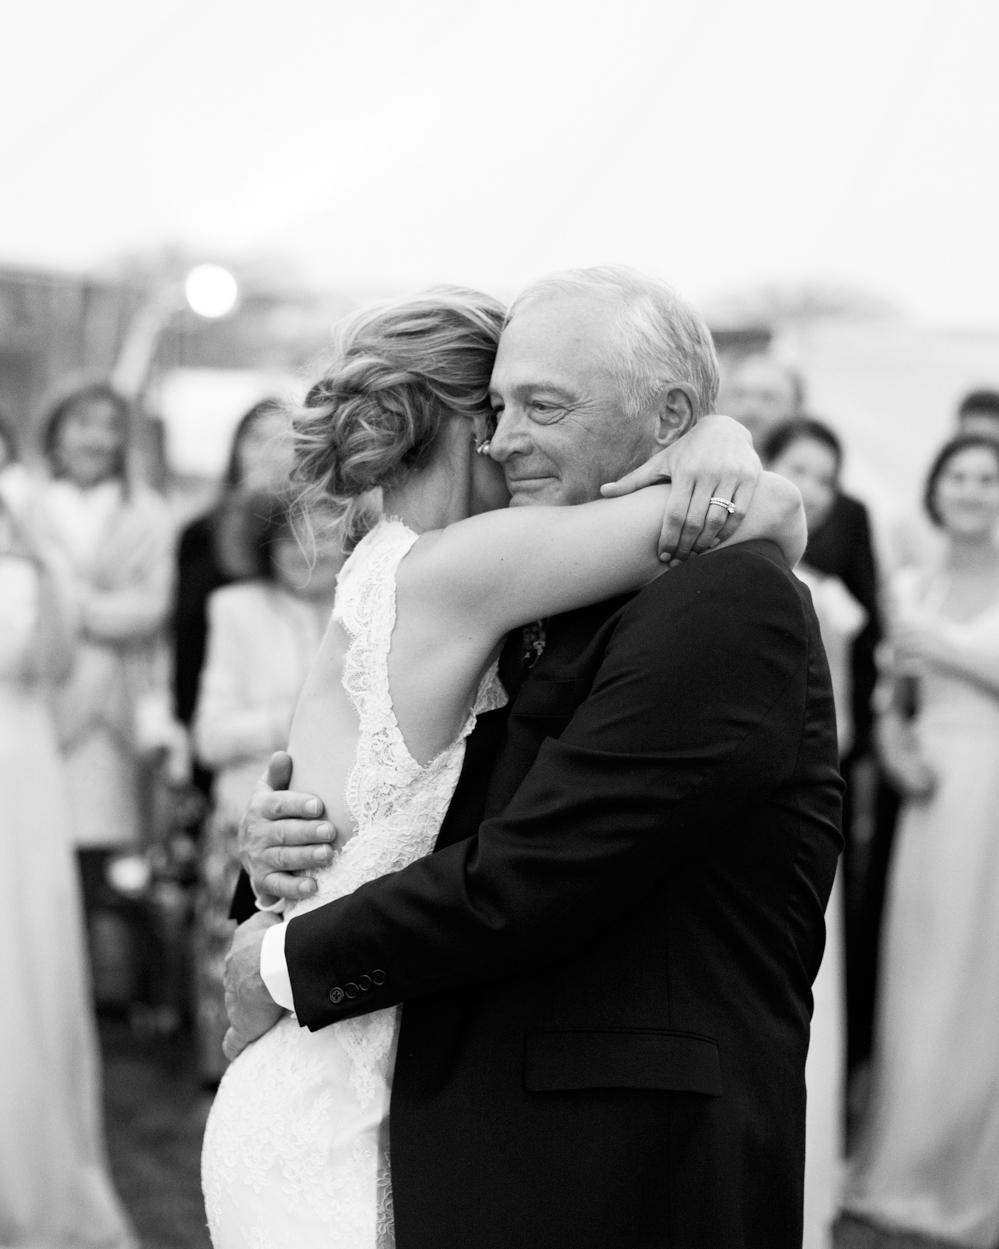 jamie-alex-wedding-daddance-256-s111544-1014.jpg